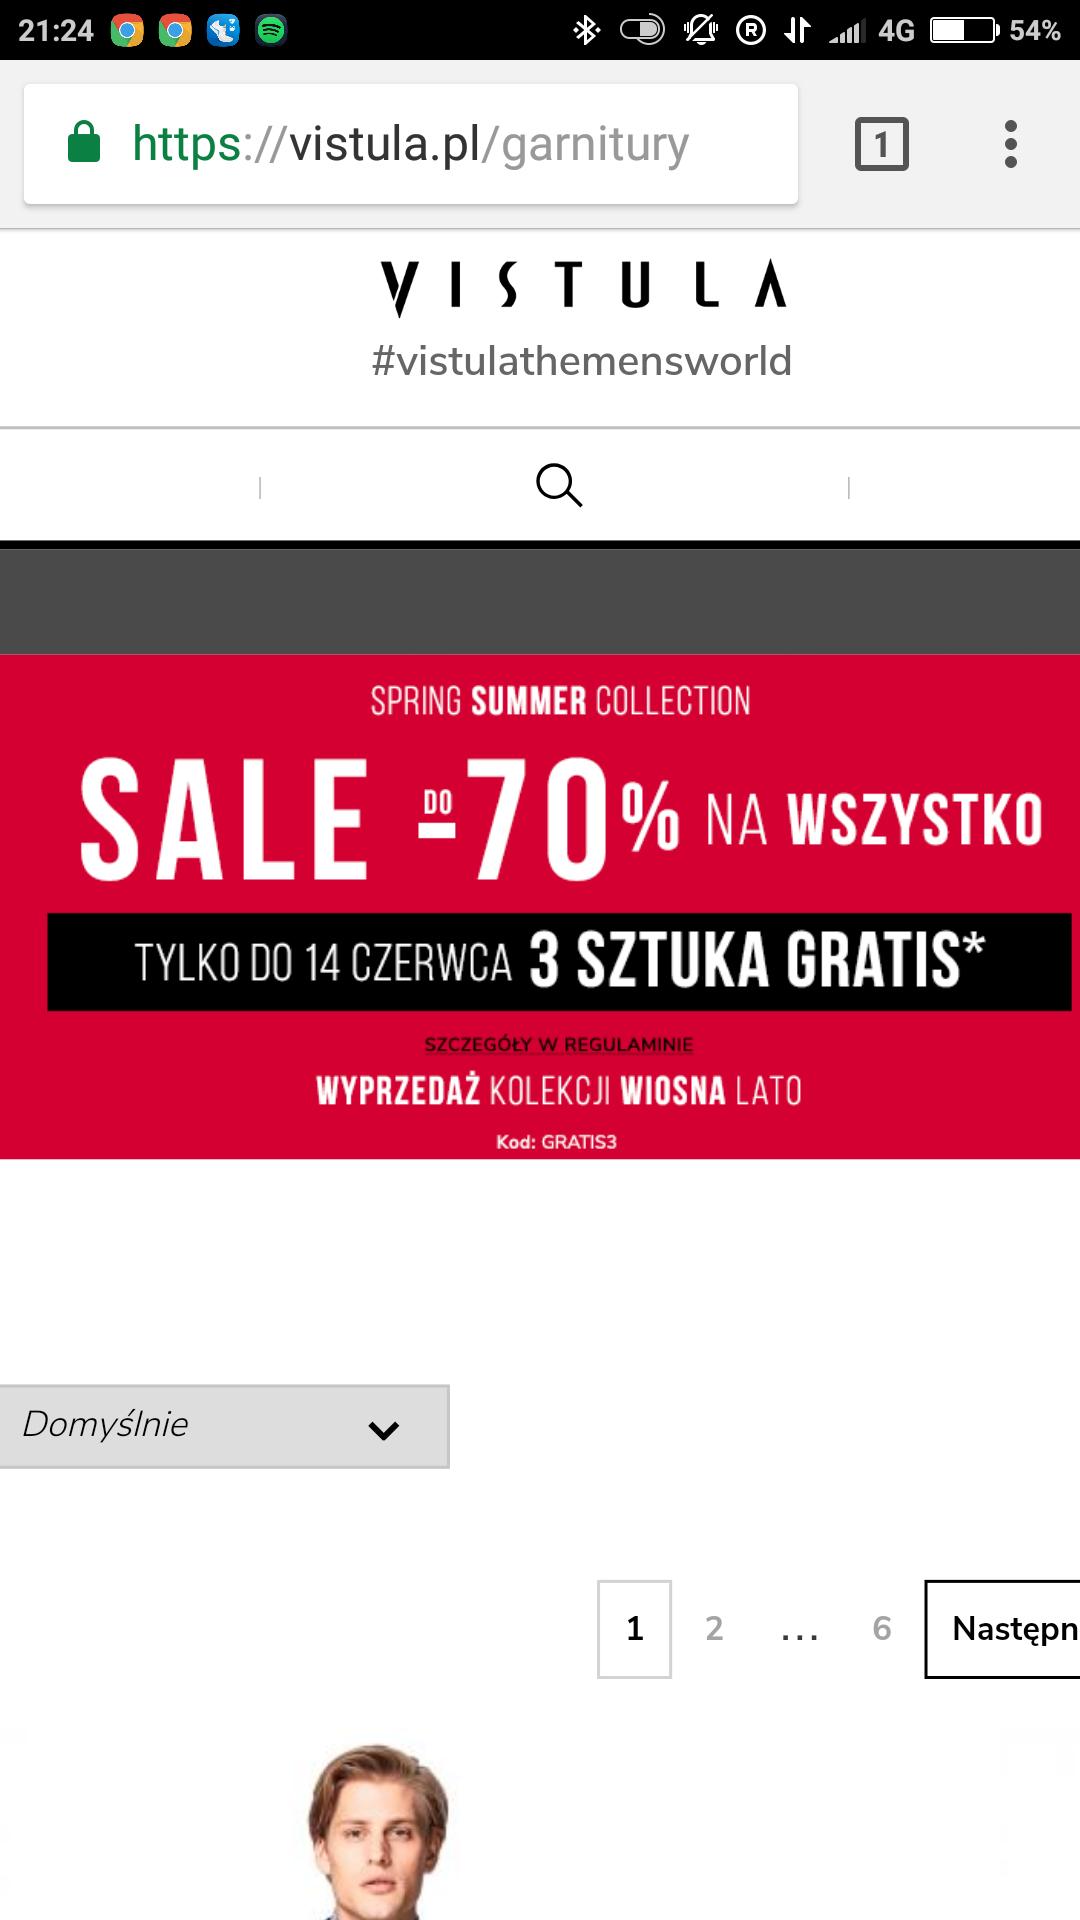 Vistula 3 sztuka gratis na produkty do - 70%